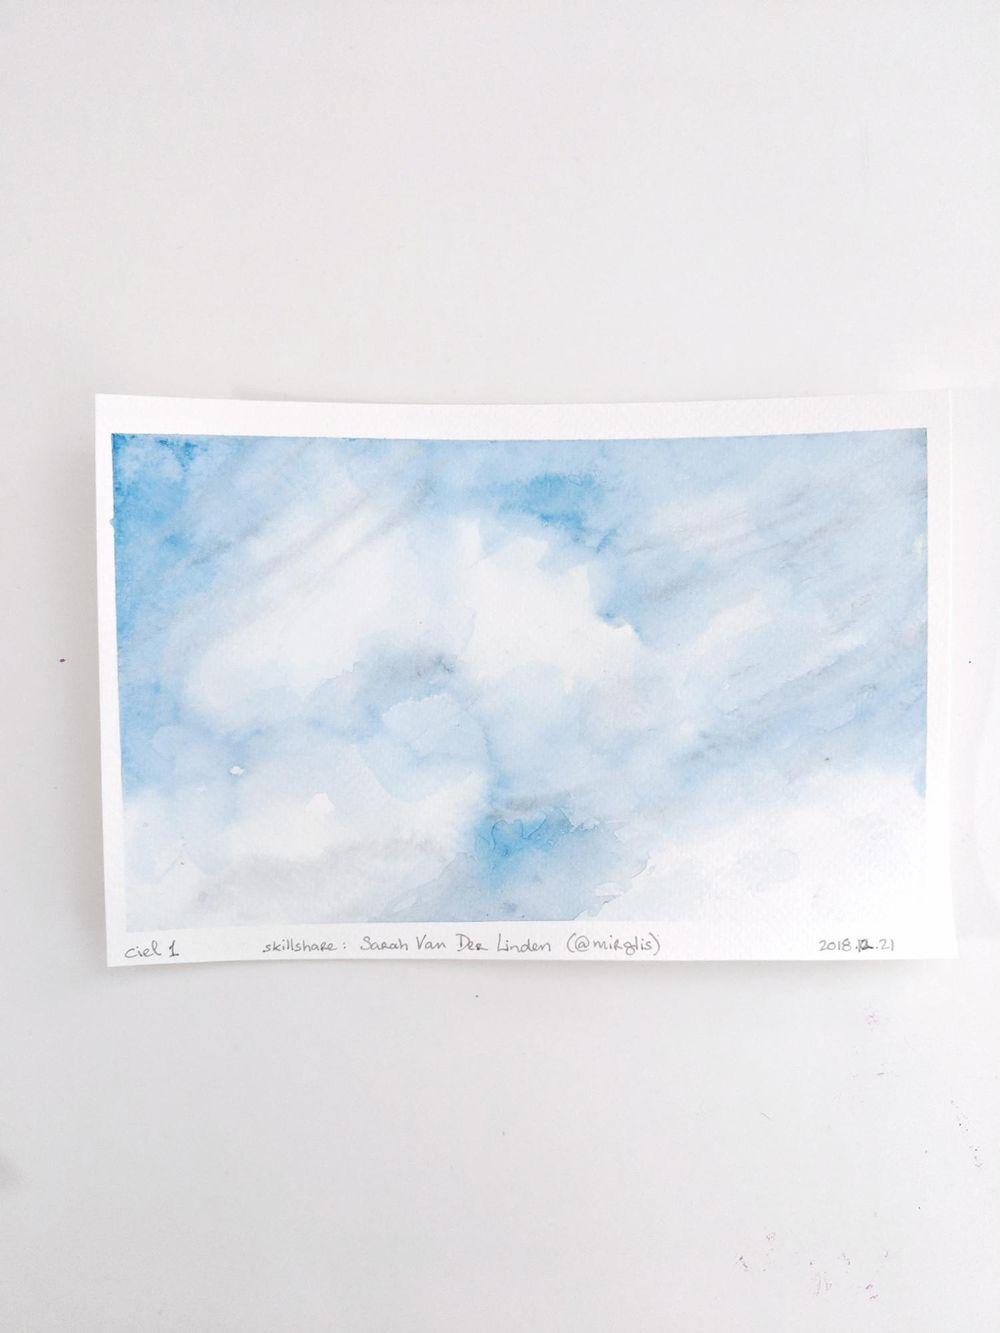 Ciels avec Sarah - image 5 - student project